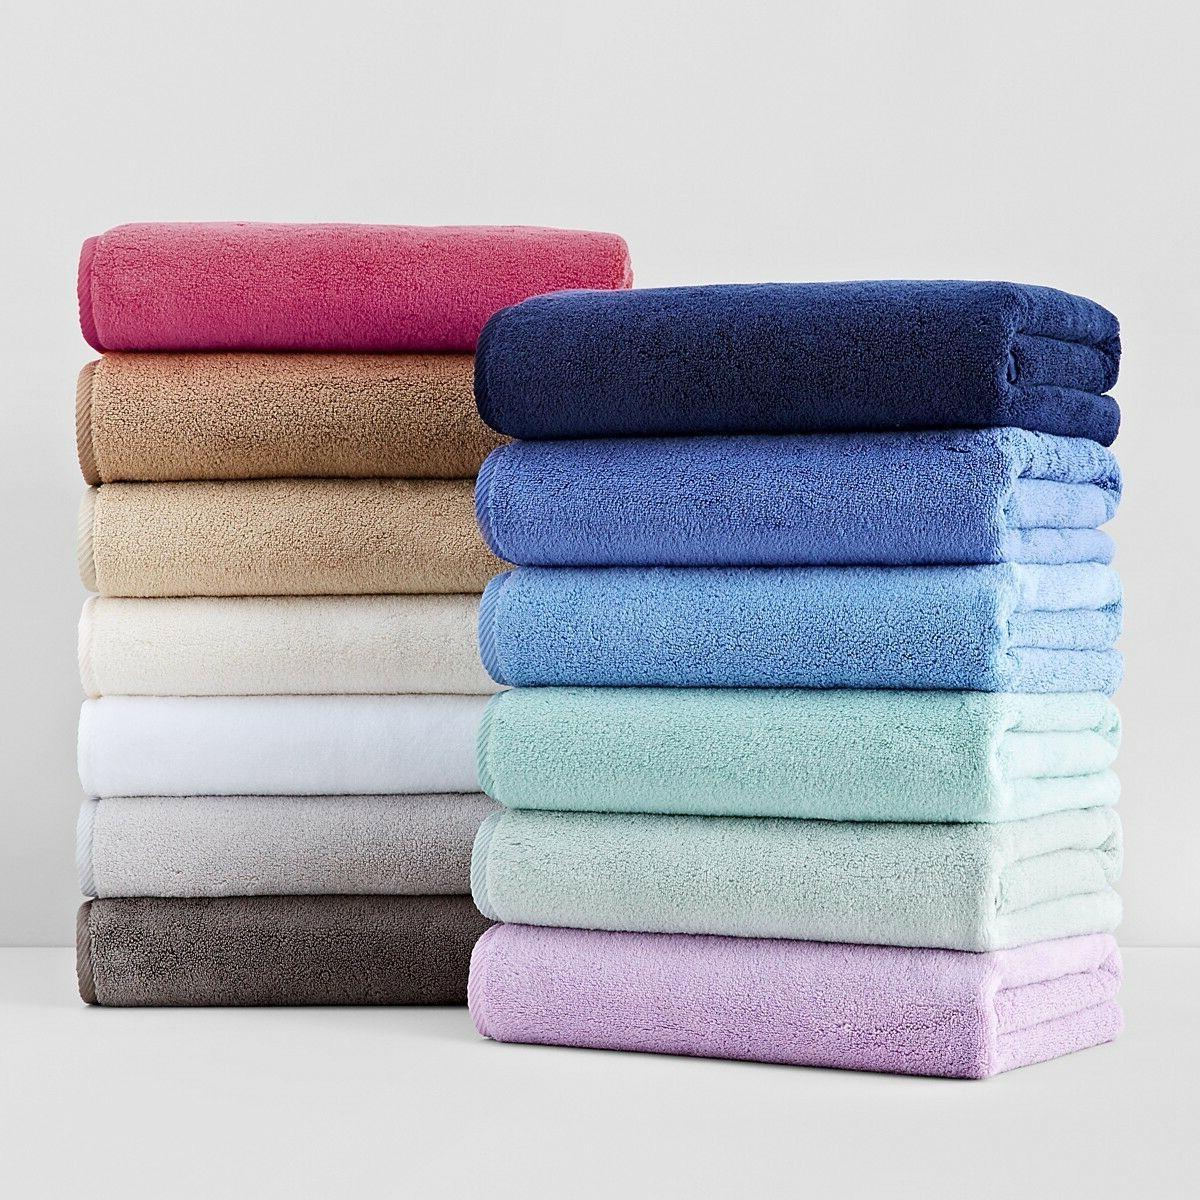 Matouk Milagro 6 Pc Bath/Tubmat/2 Hand/Fingertip/Washcloth T